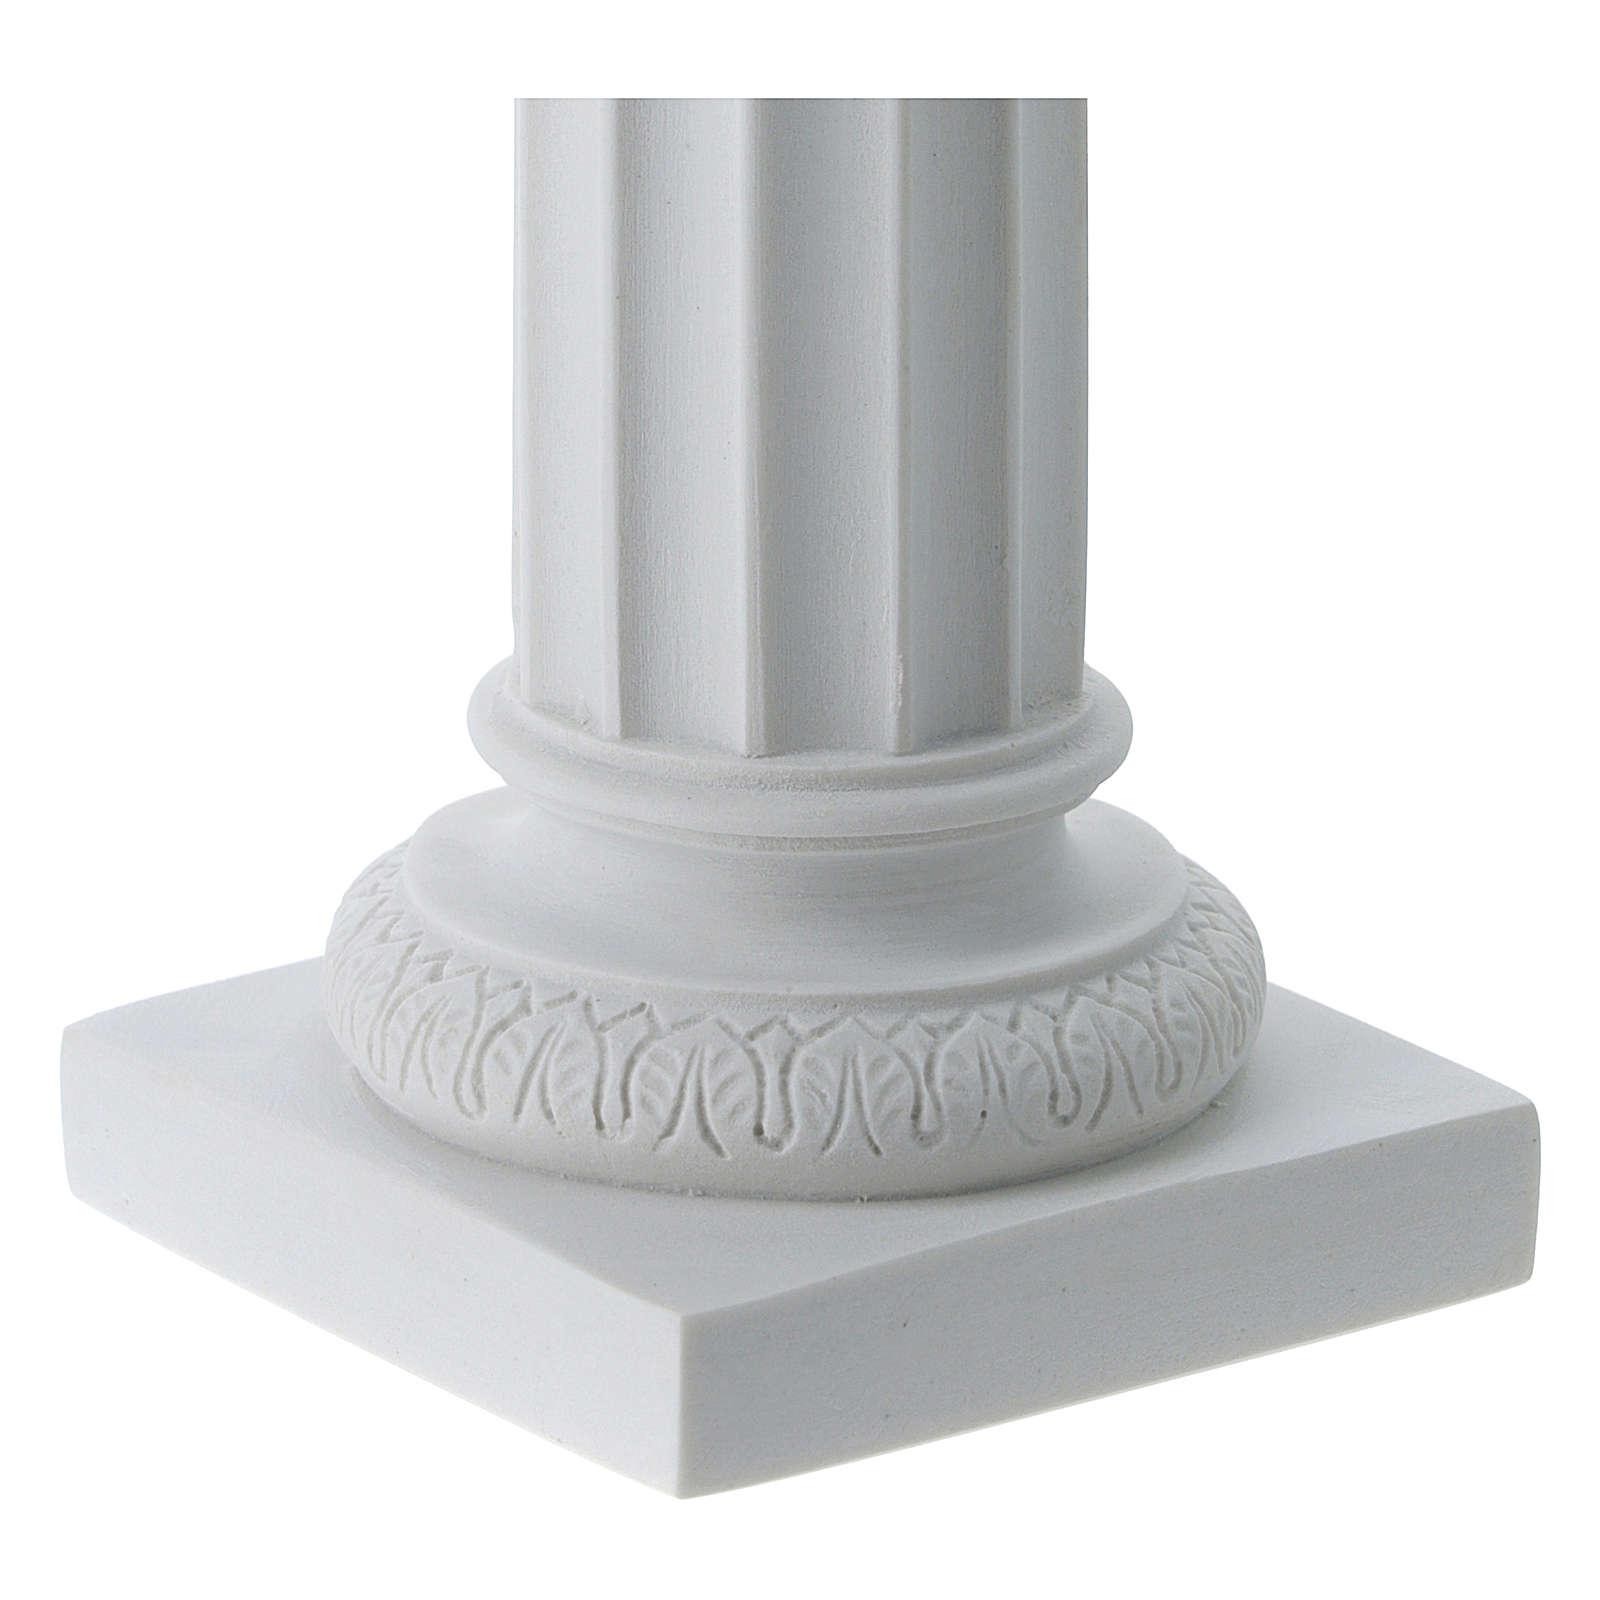 Column in full relief, reconstituted white Carrara marble 4